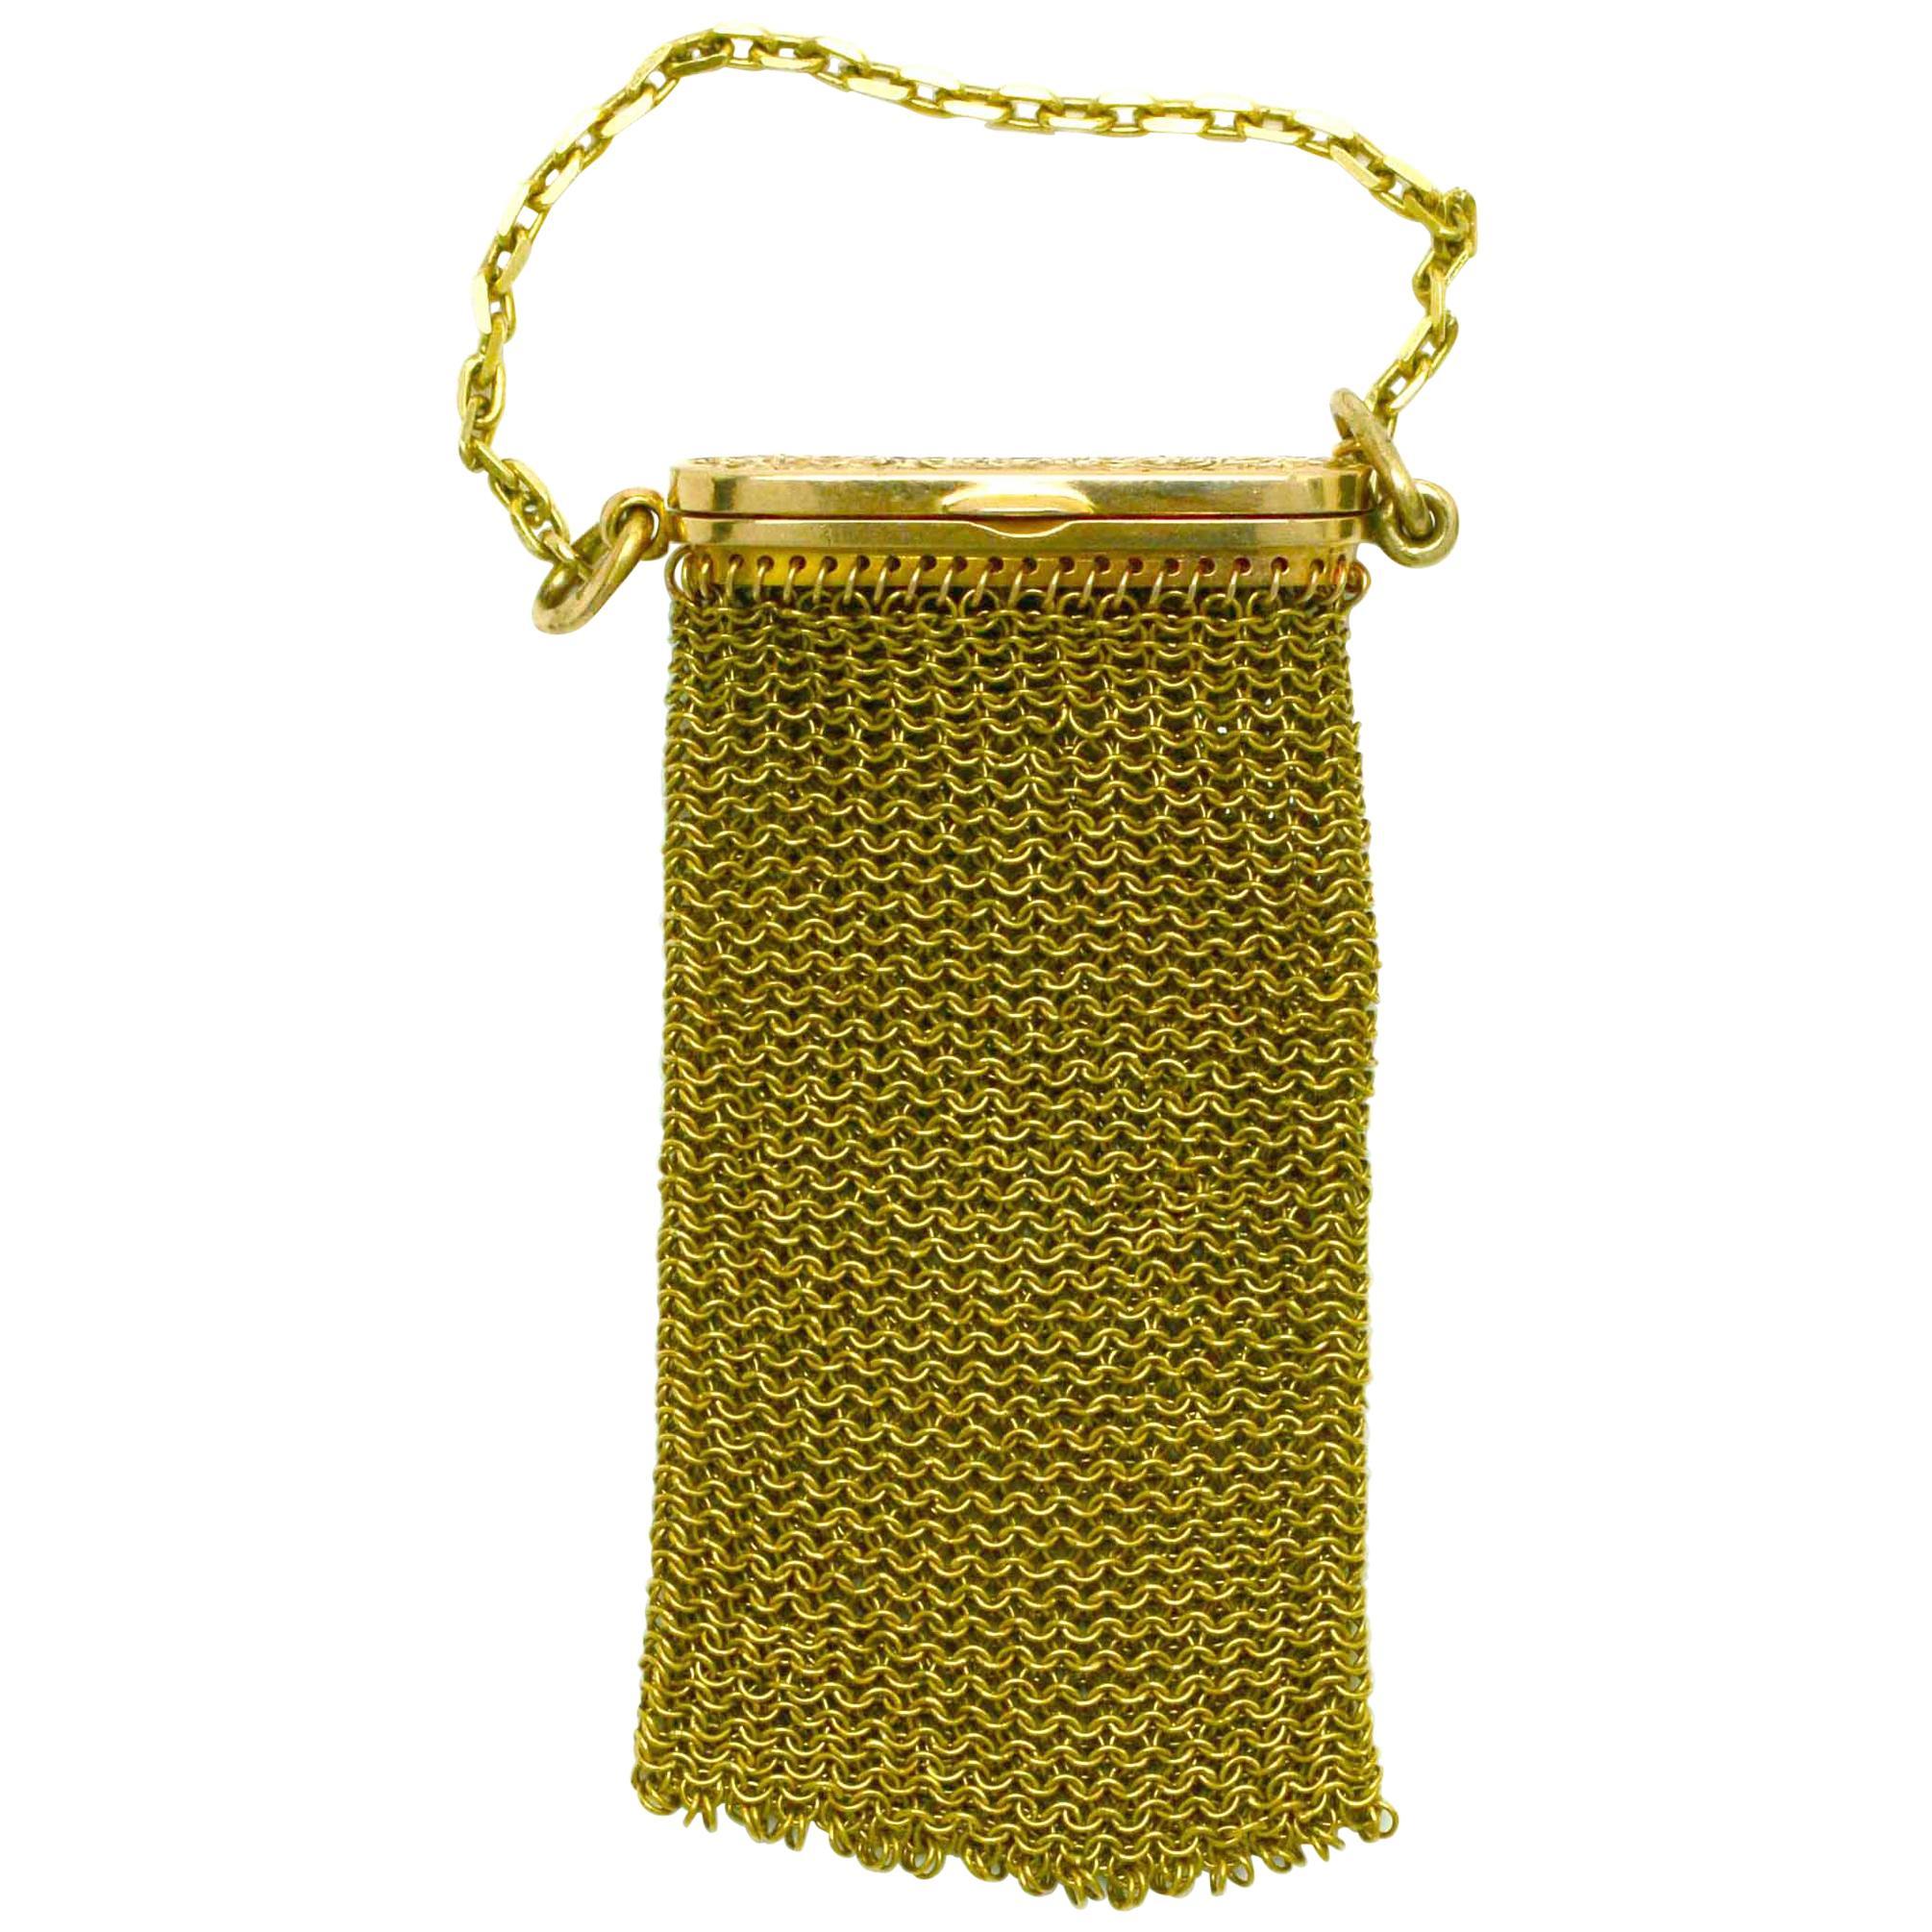 Antique Miniature Woven Mesh Coin Purse Pendant Pouch Victorian Yellow Rose Gold